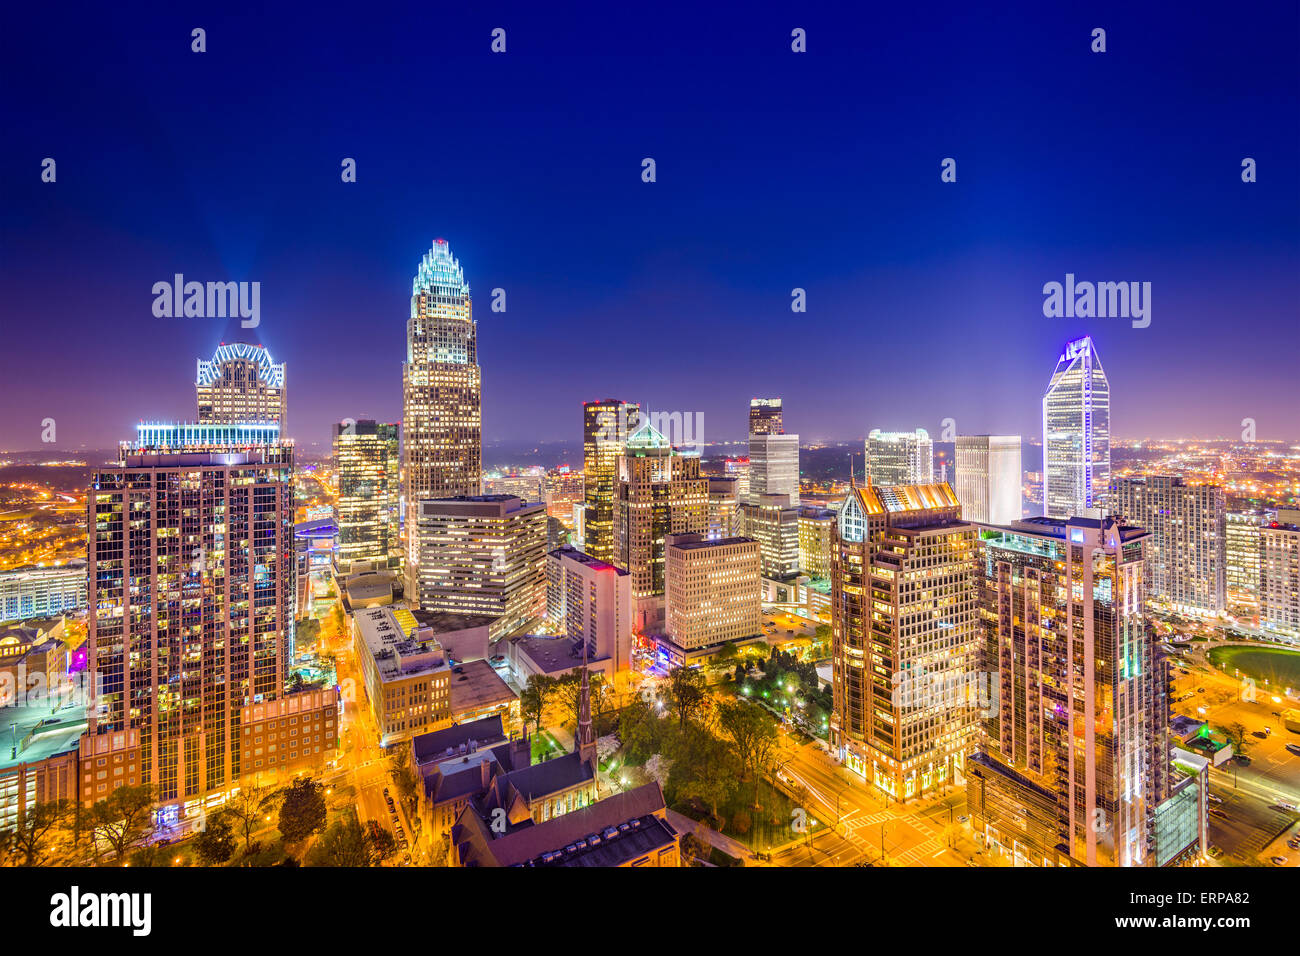 Charlotte, Carolina del Norte, EE.UU uptown skyline en la noche. Imagen De Stock